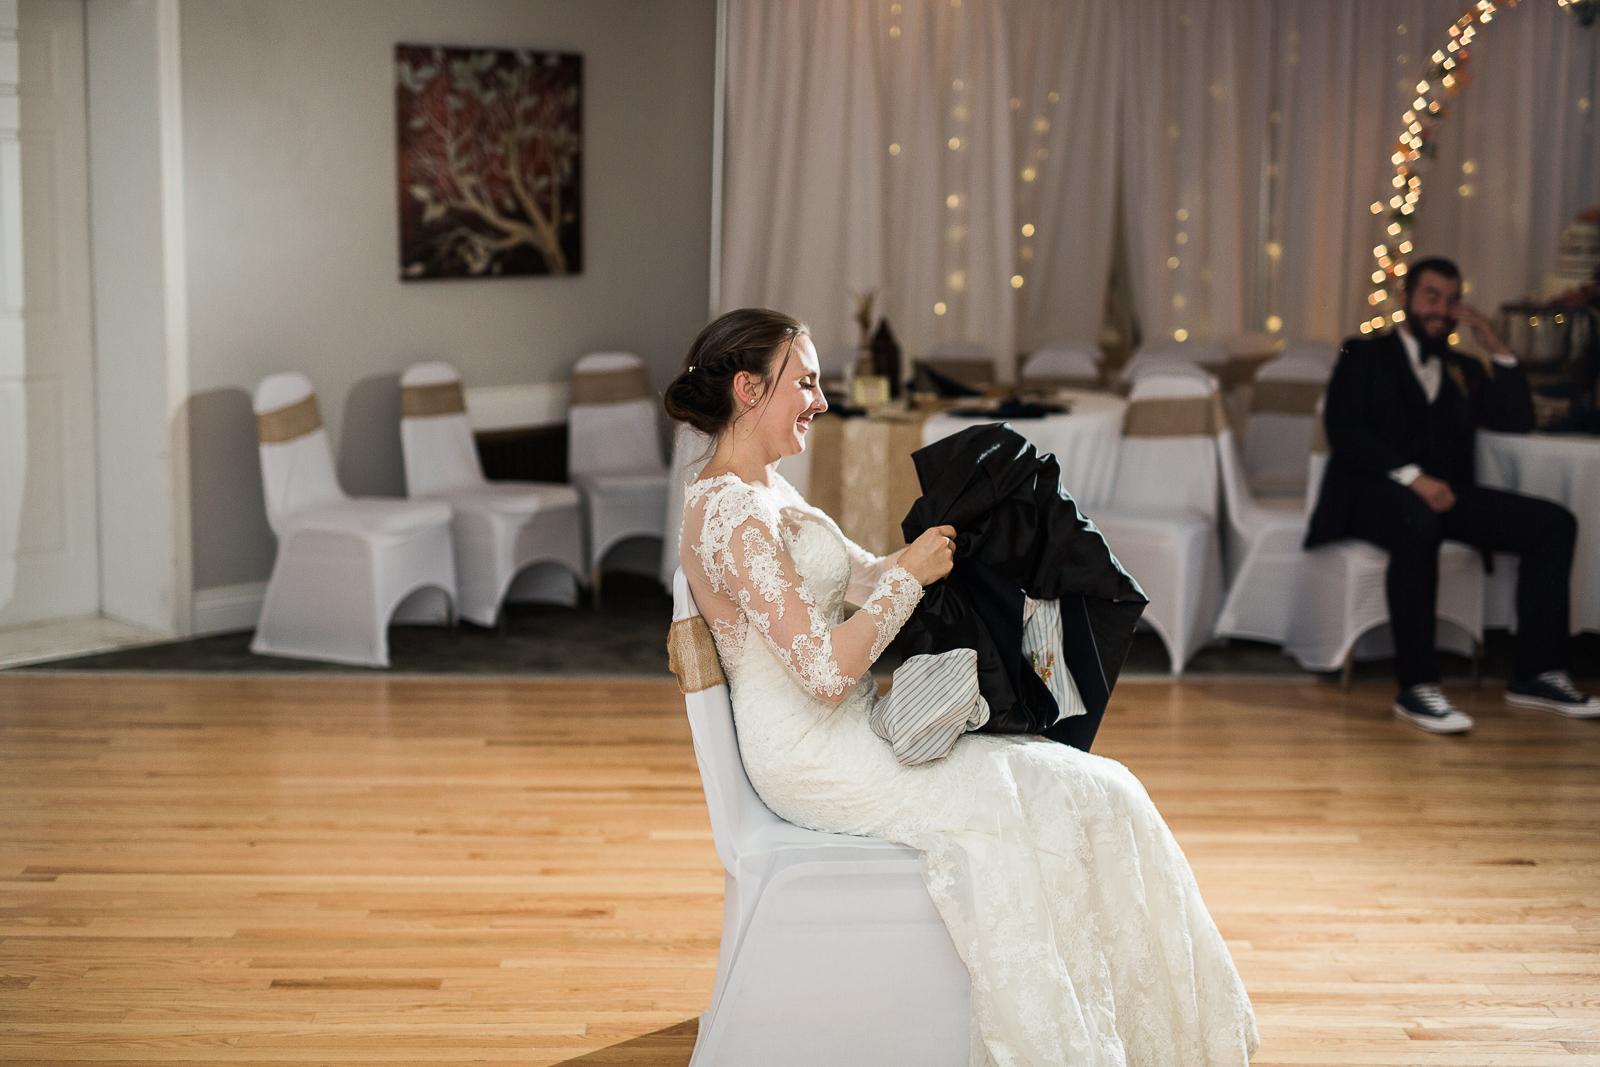 gander-wedding-photographer-156.jpg